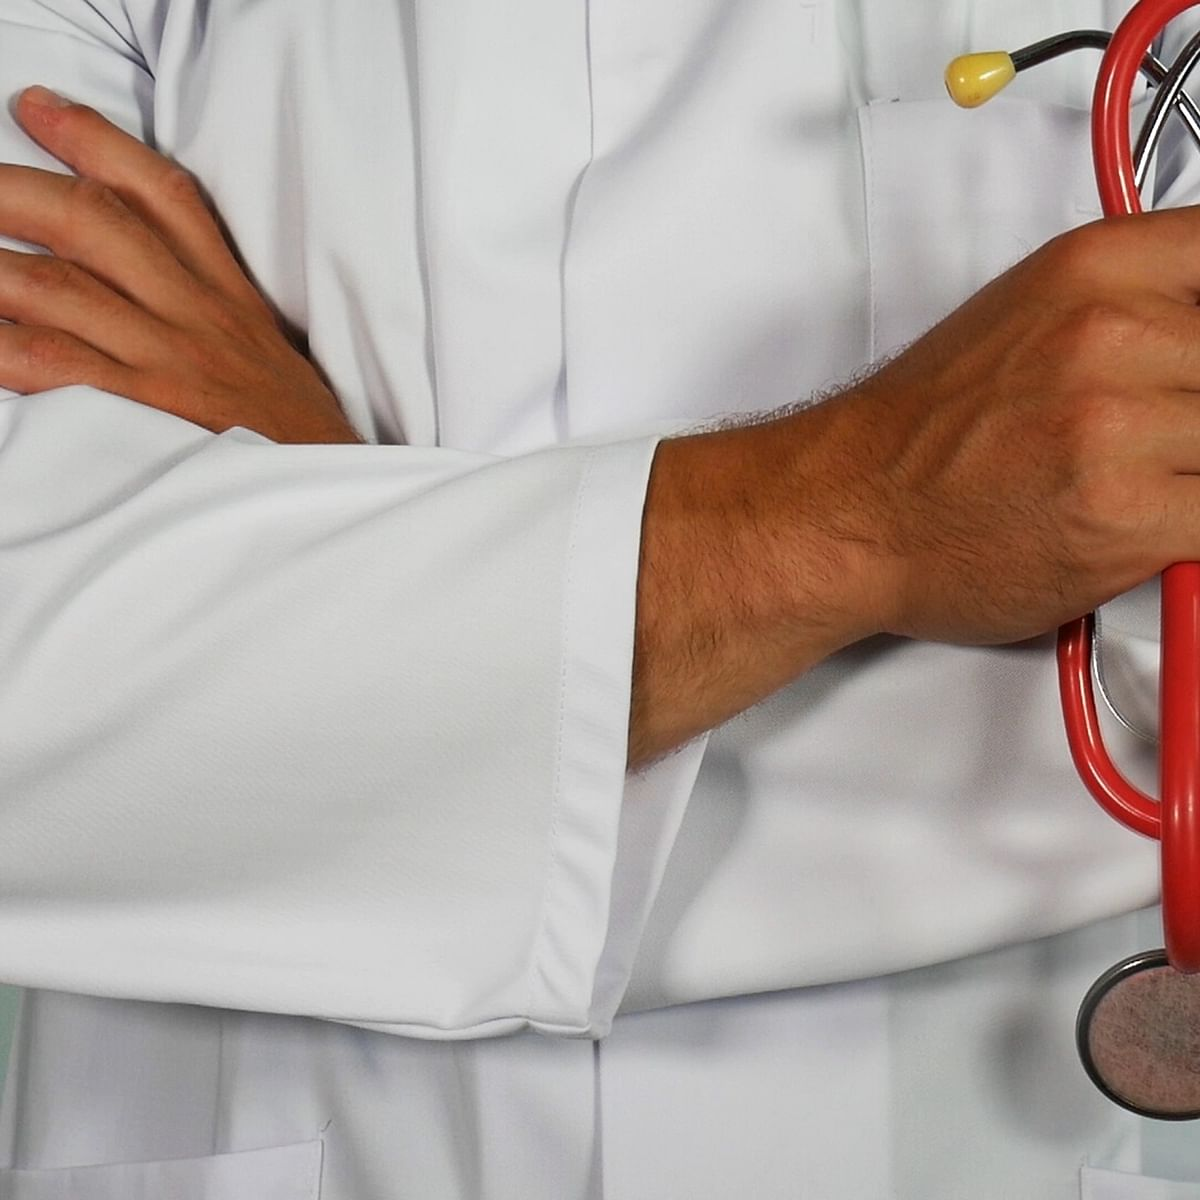 Doctor (Representational Image)